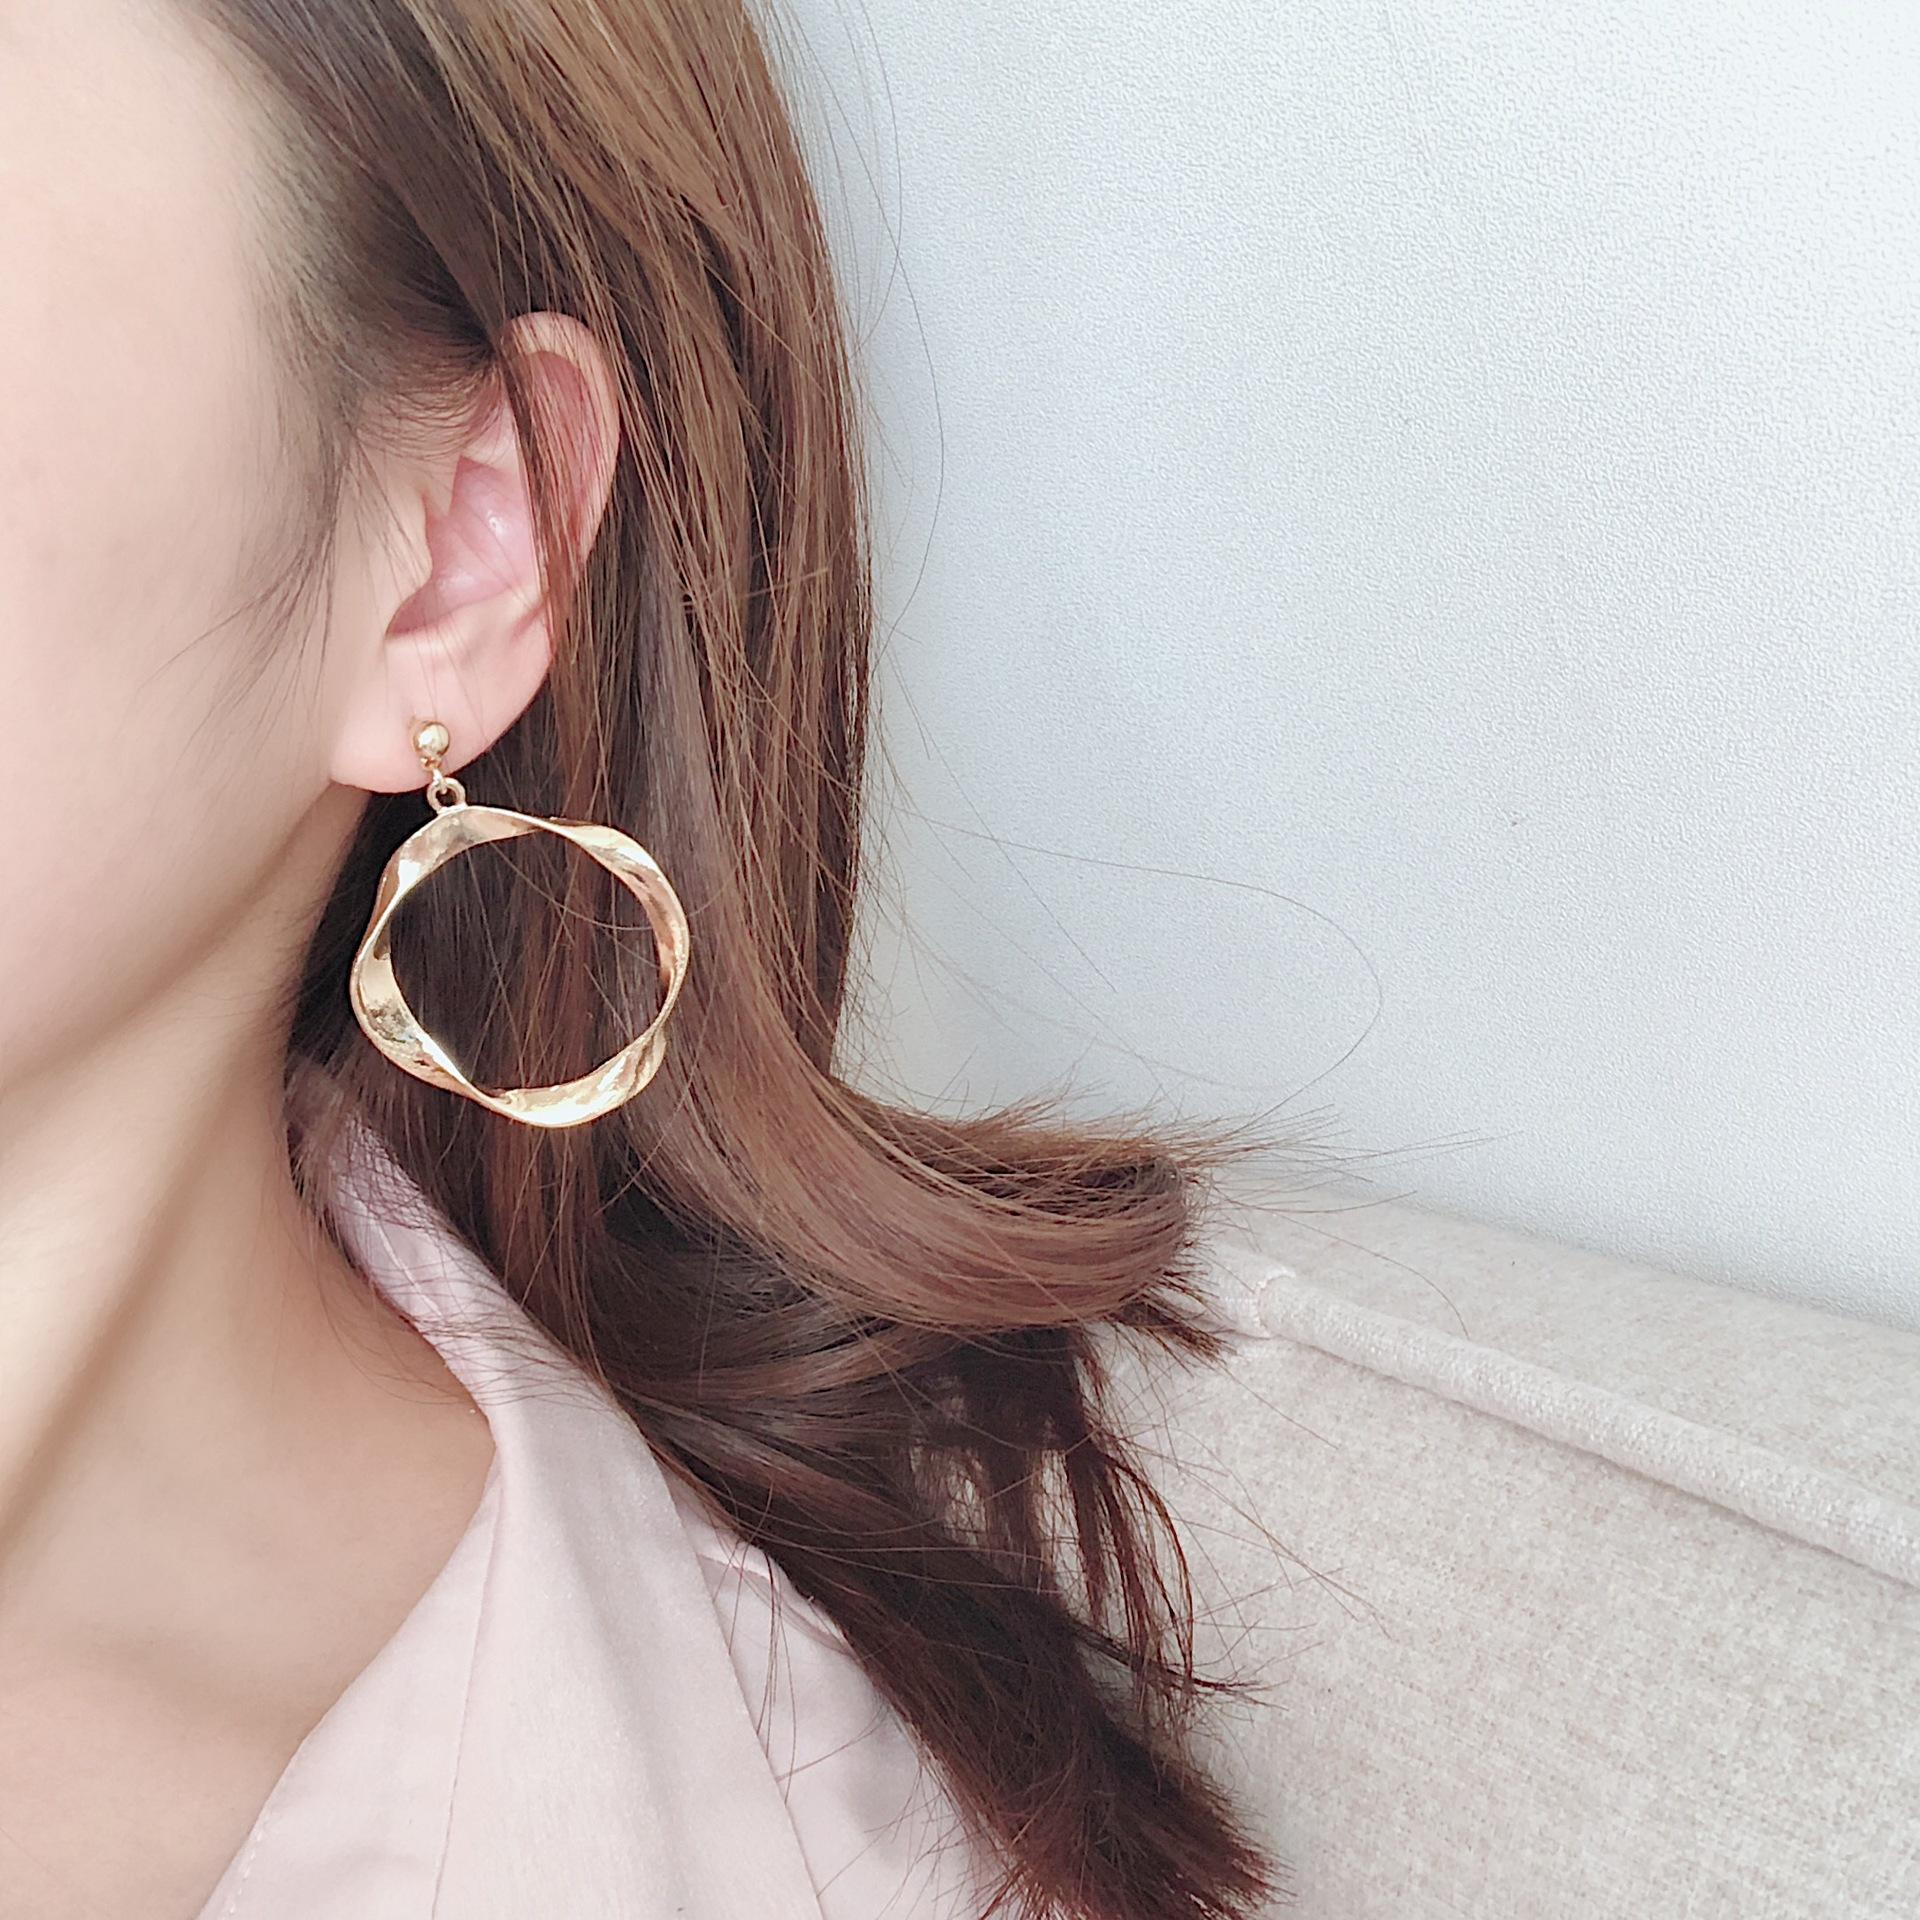 Alloy Fashion Geometric earring  (Alloy) NHYT1407-Alloy